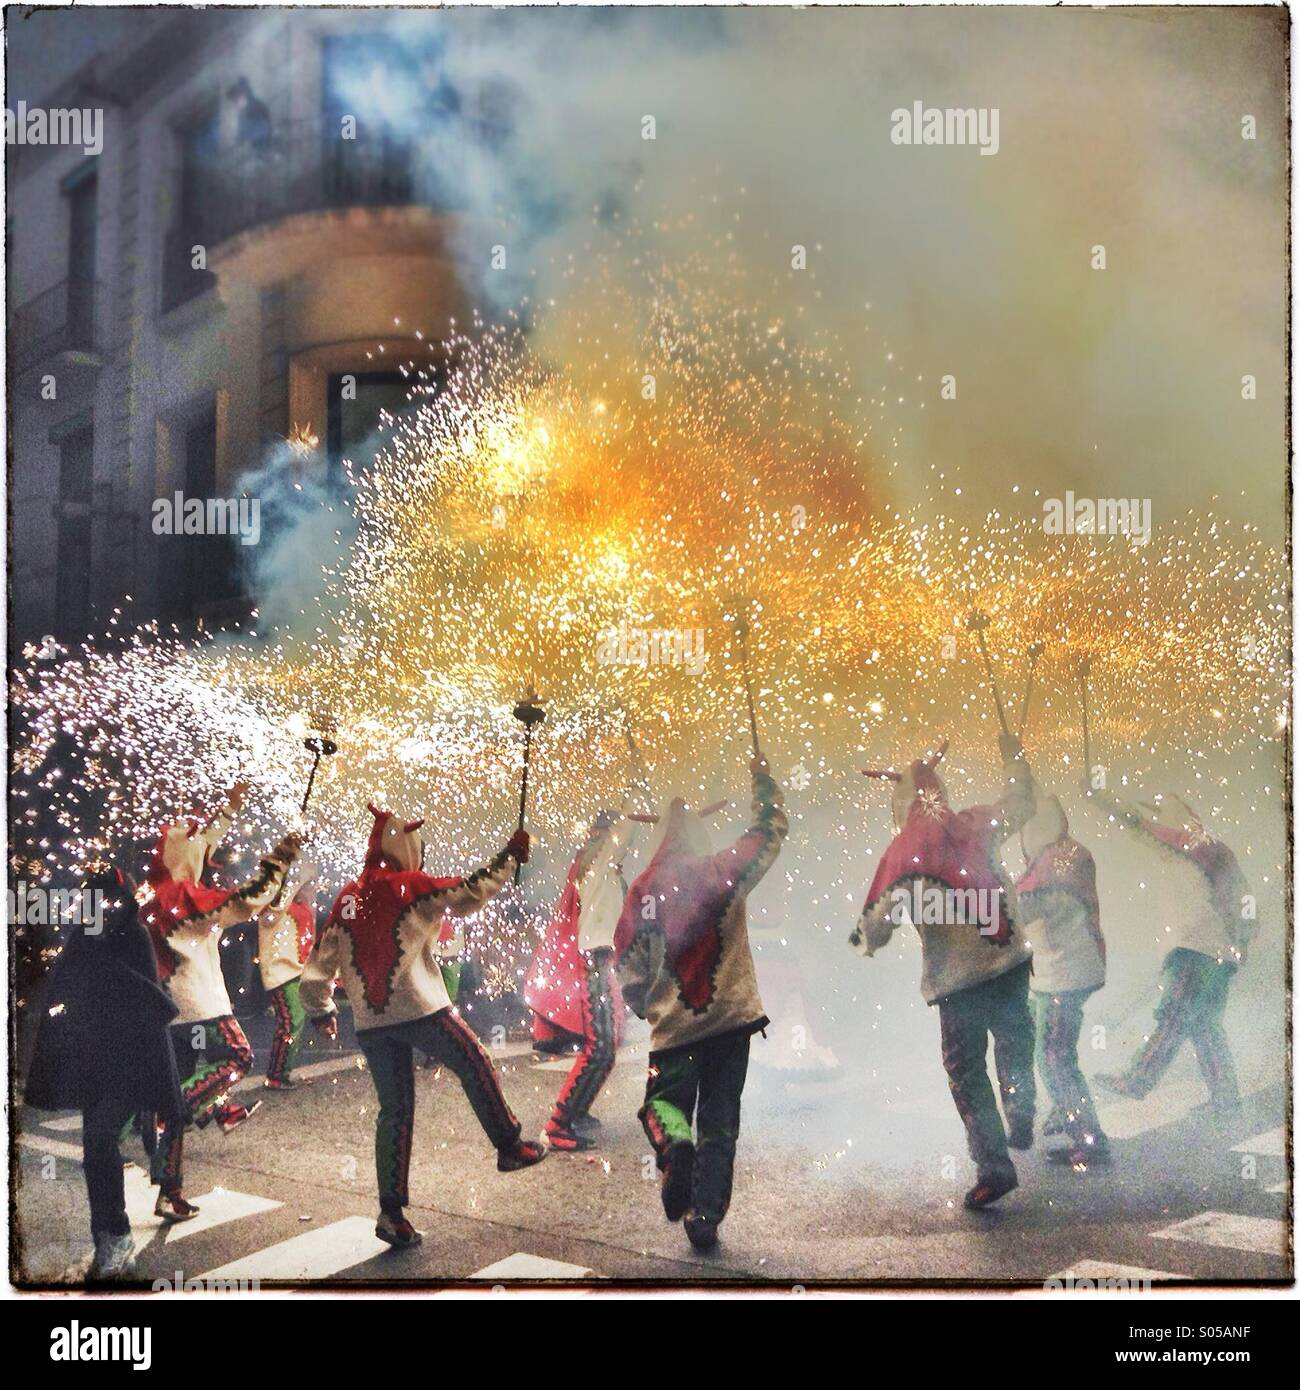 Correfoc, Feuerwerk, Les Santes, Mataró Stadtfest, Juli, Barcelona, Spanien. Feuer-Spiele in Katalonien Stockbild